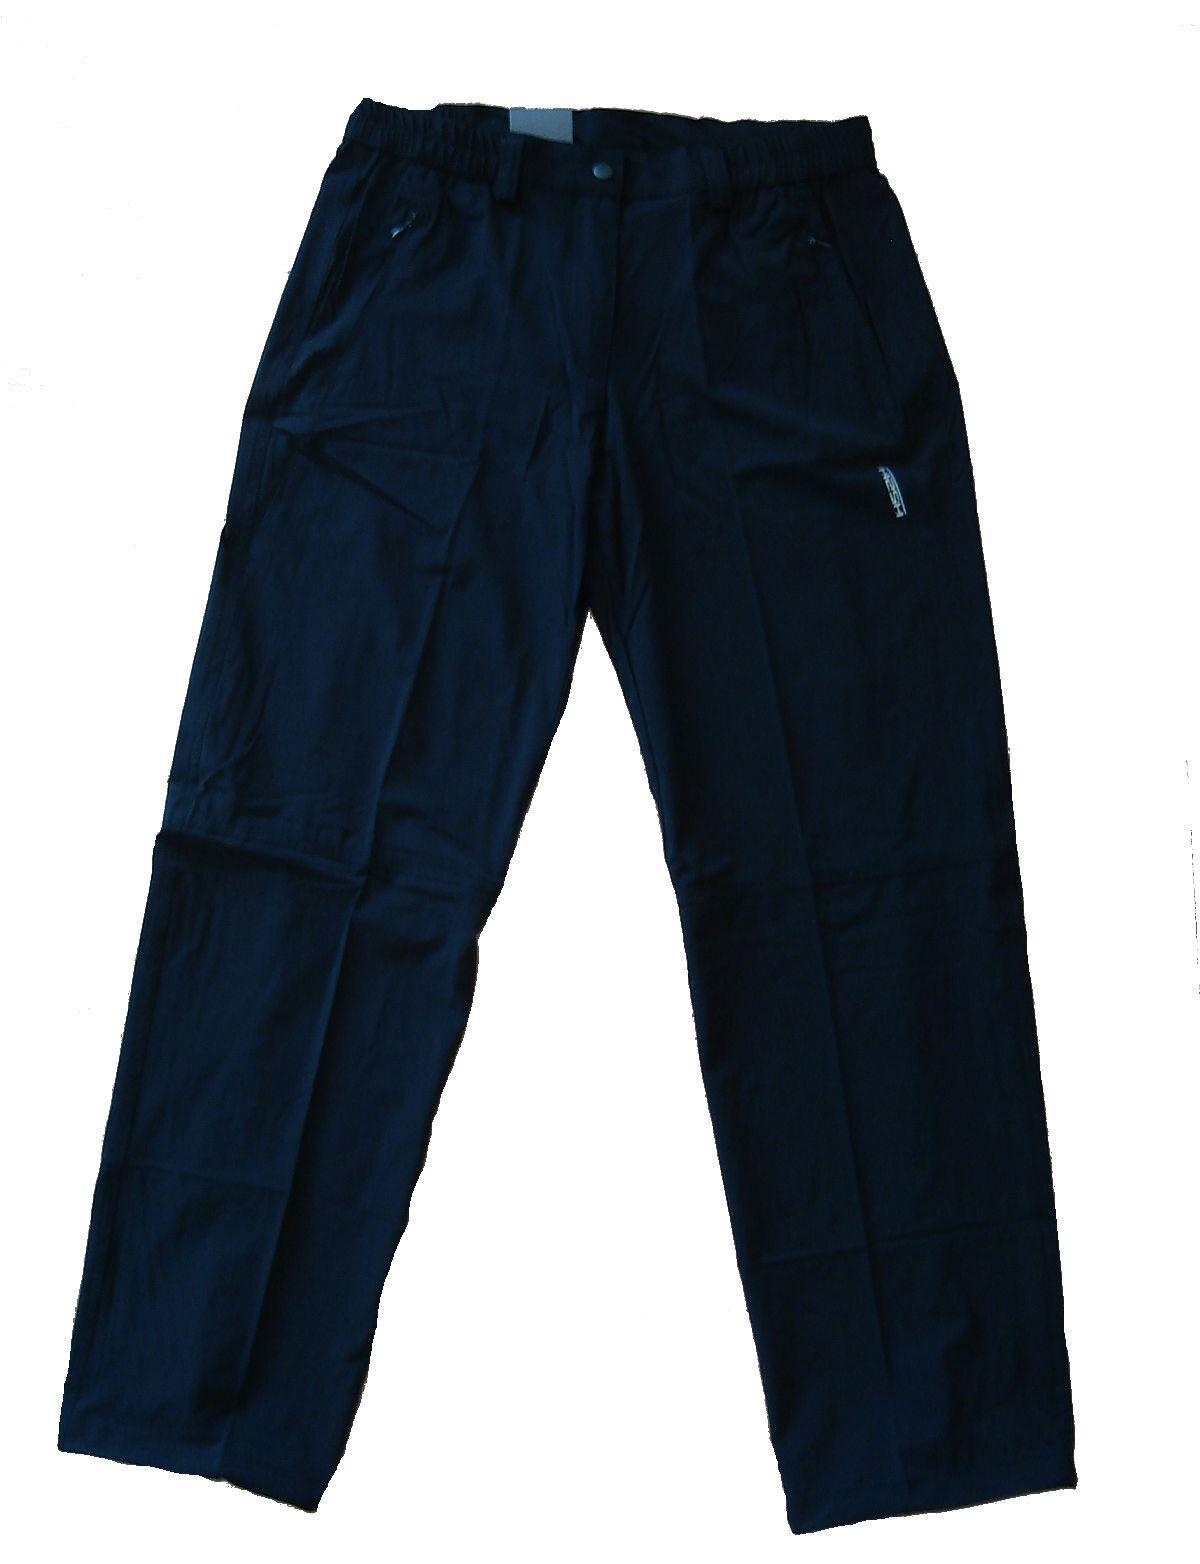 Hot Sportswear Damen Wanderhose Bristol ultraleichte Hose Travelhose Travelhose Travelhose N+K-Größen 1e4fda